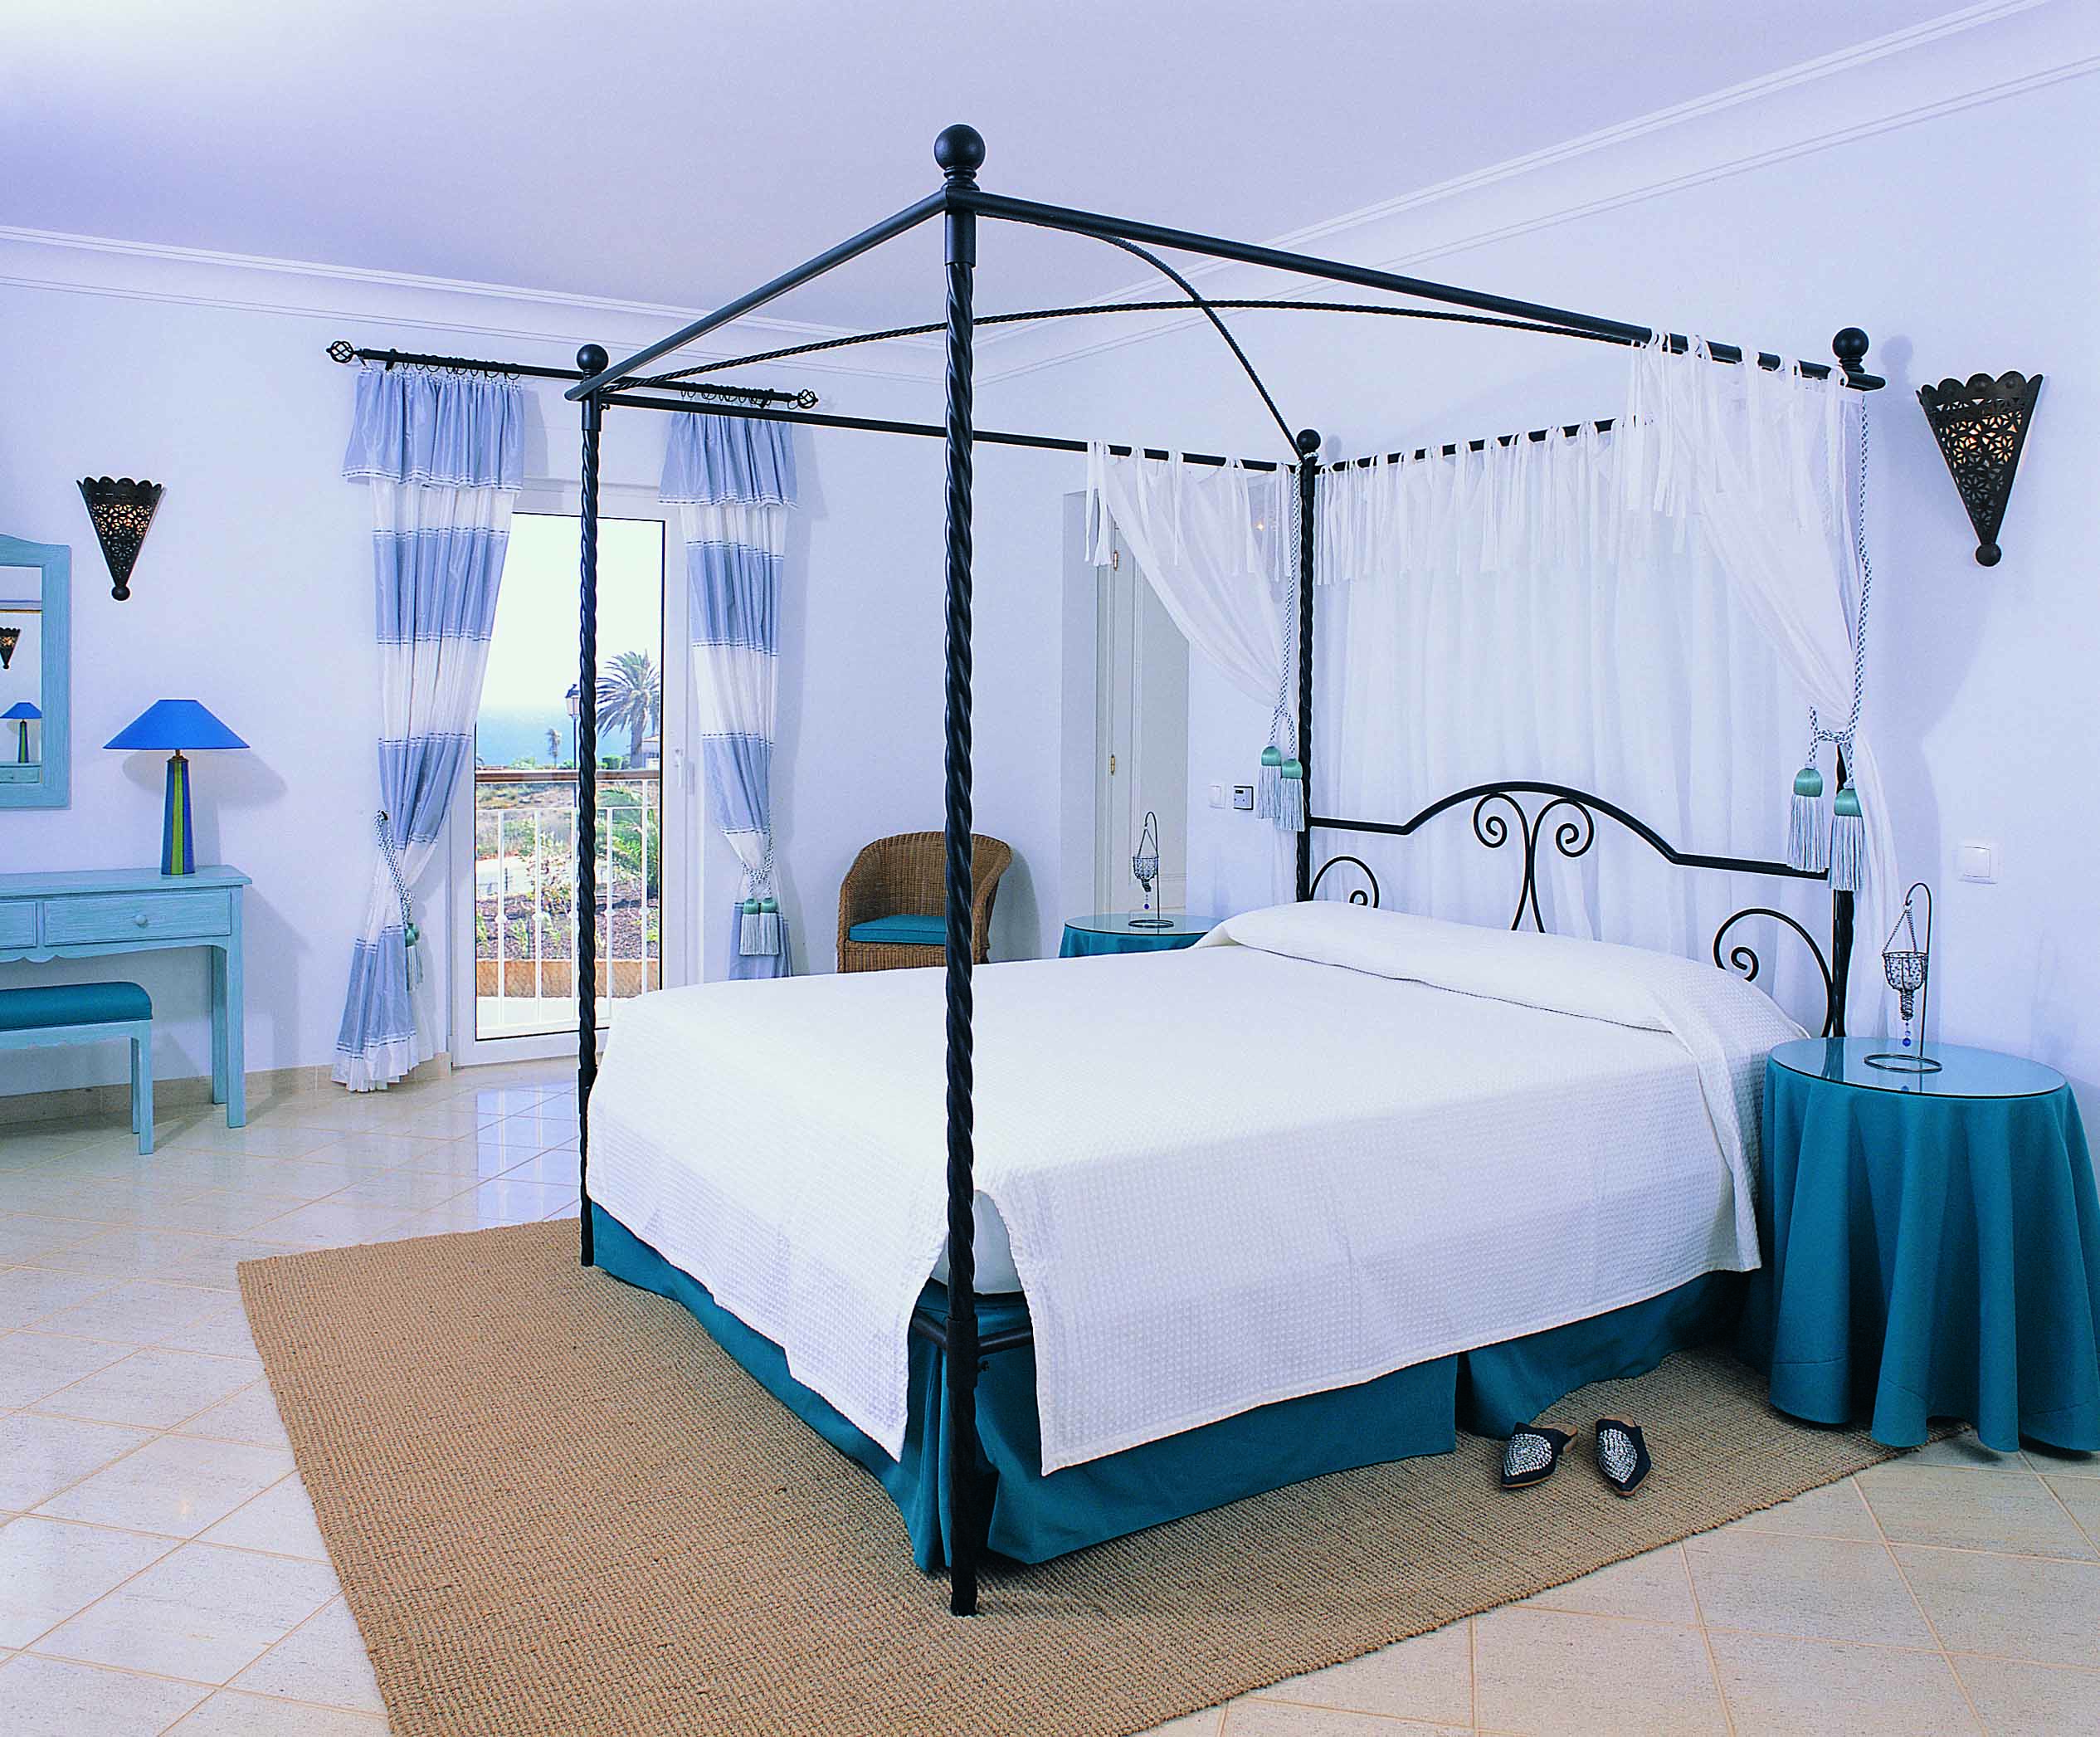 Stunning Villa with Sea Views in Praia da Luz  - 4 Bedrooms